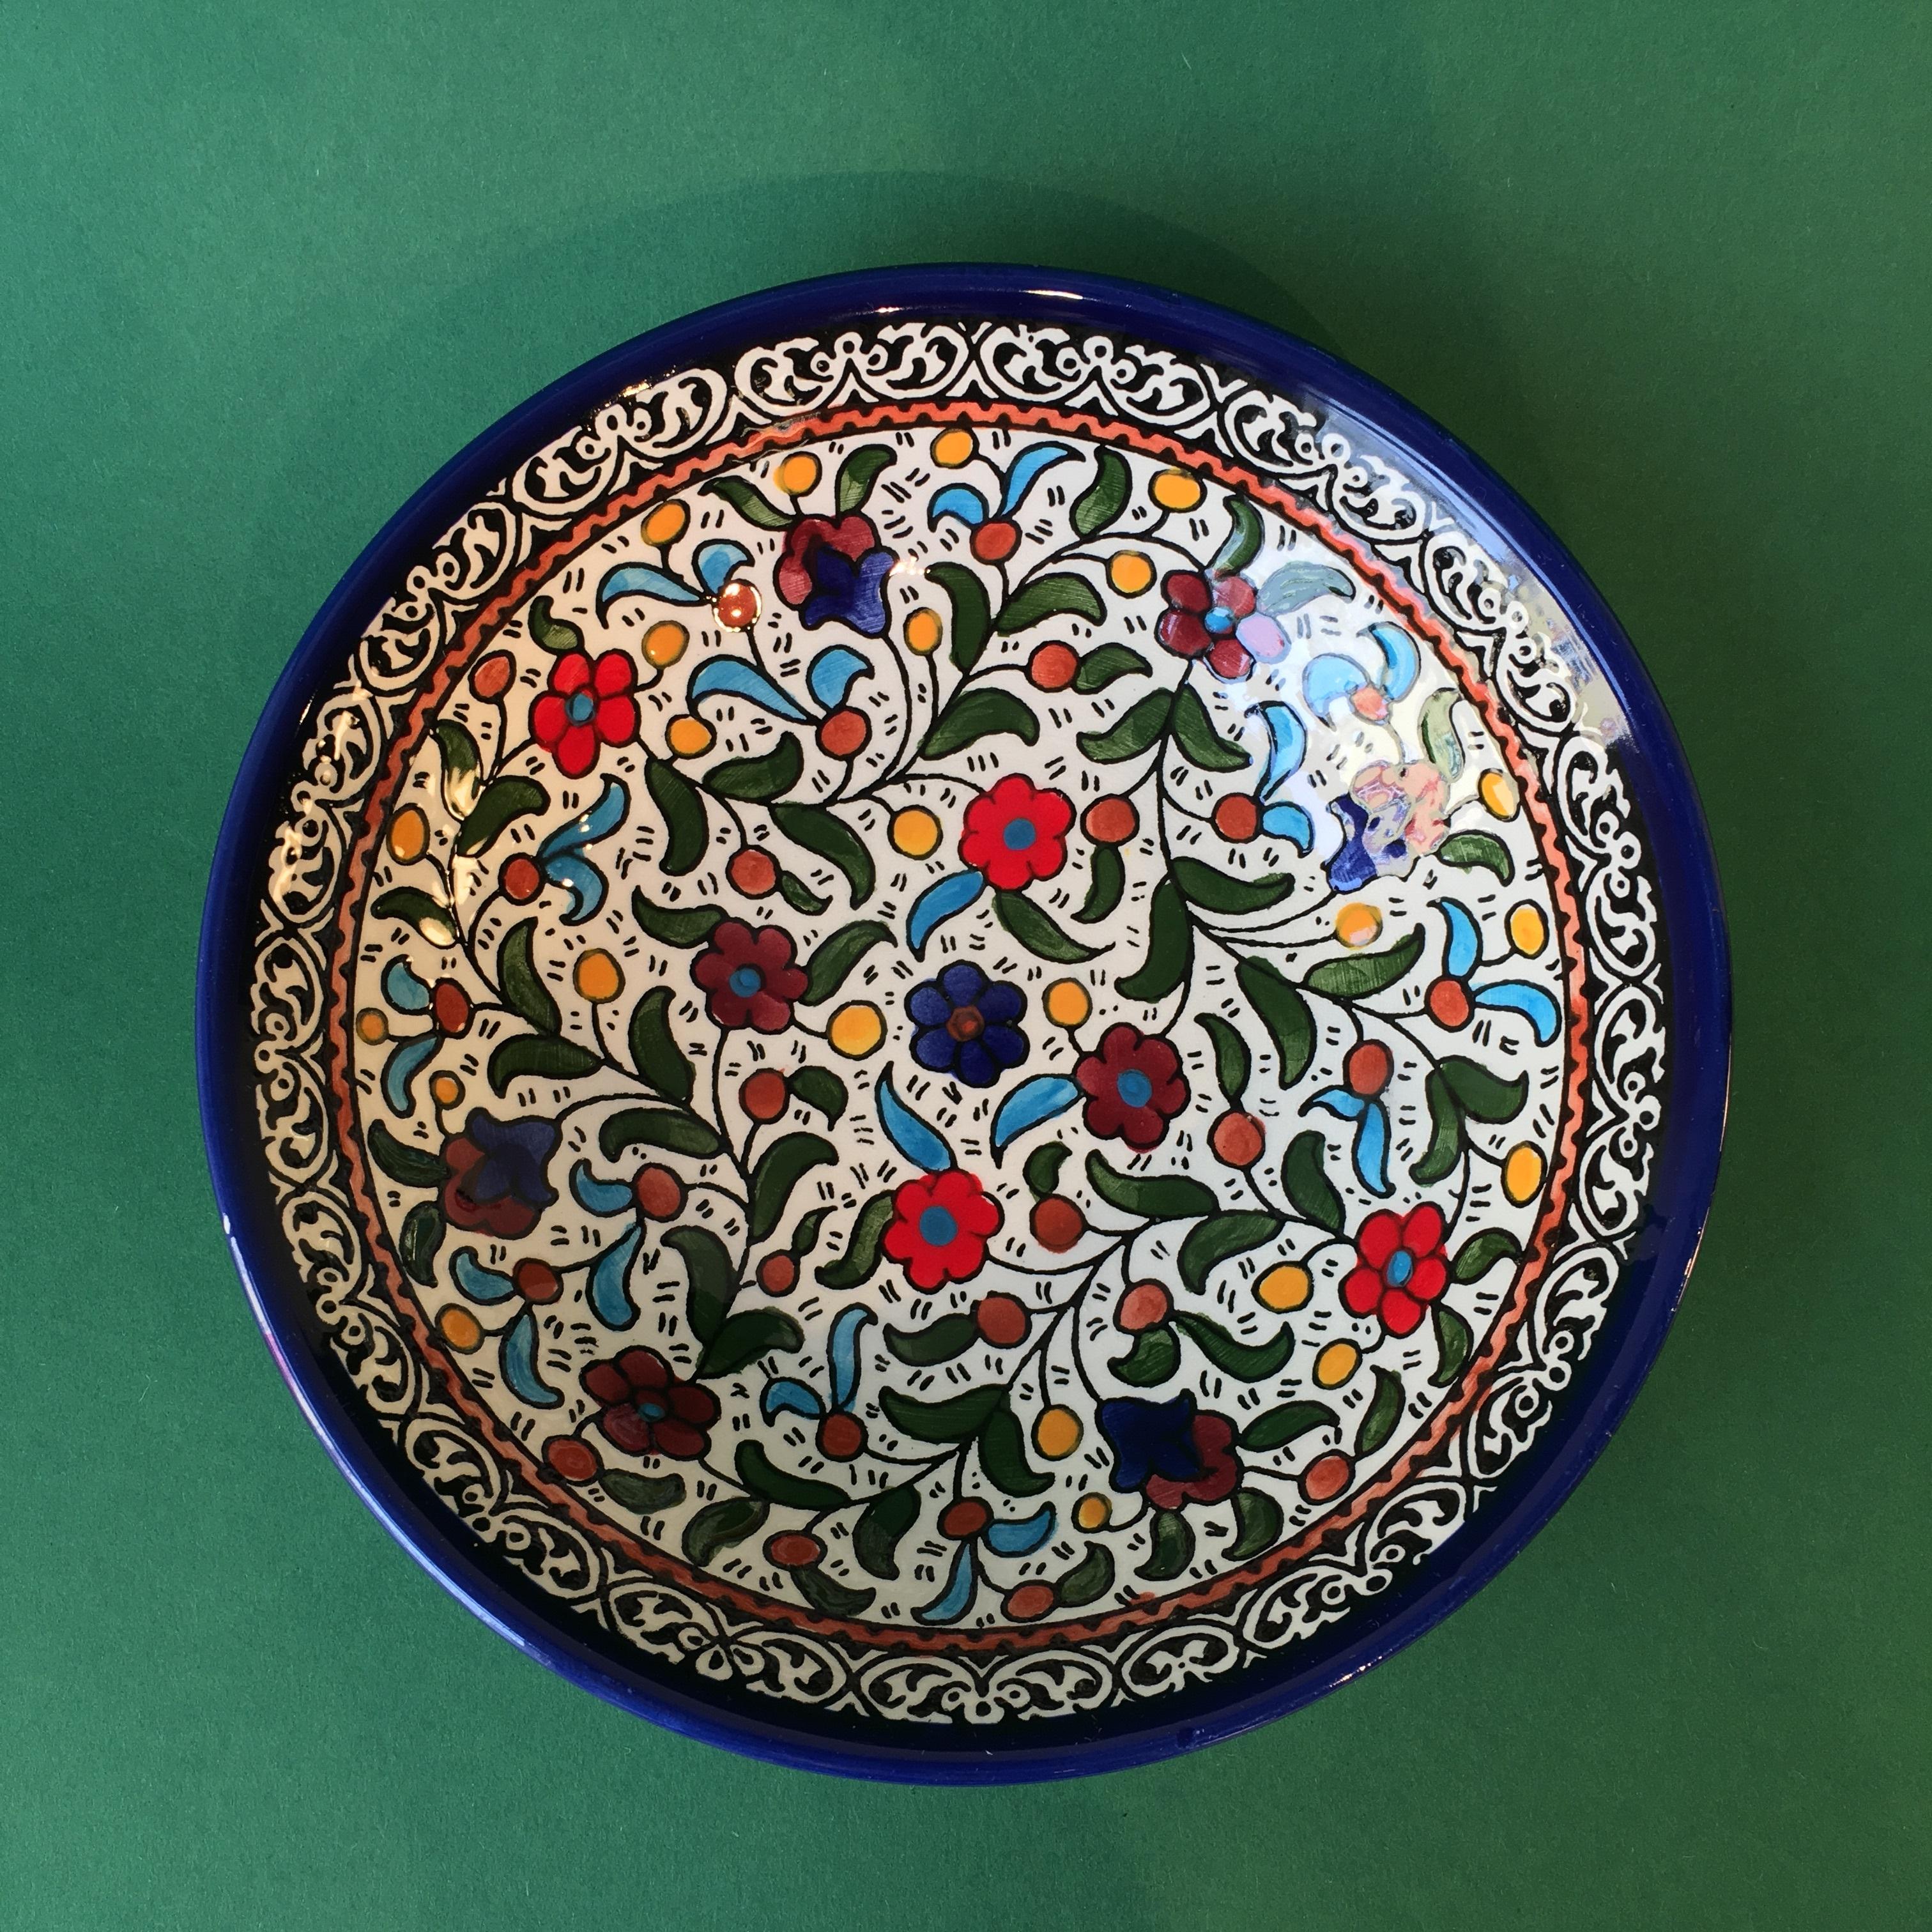 Stor keramikkskål, flerfarget (lite mønster)